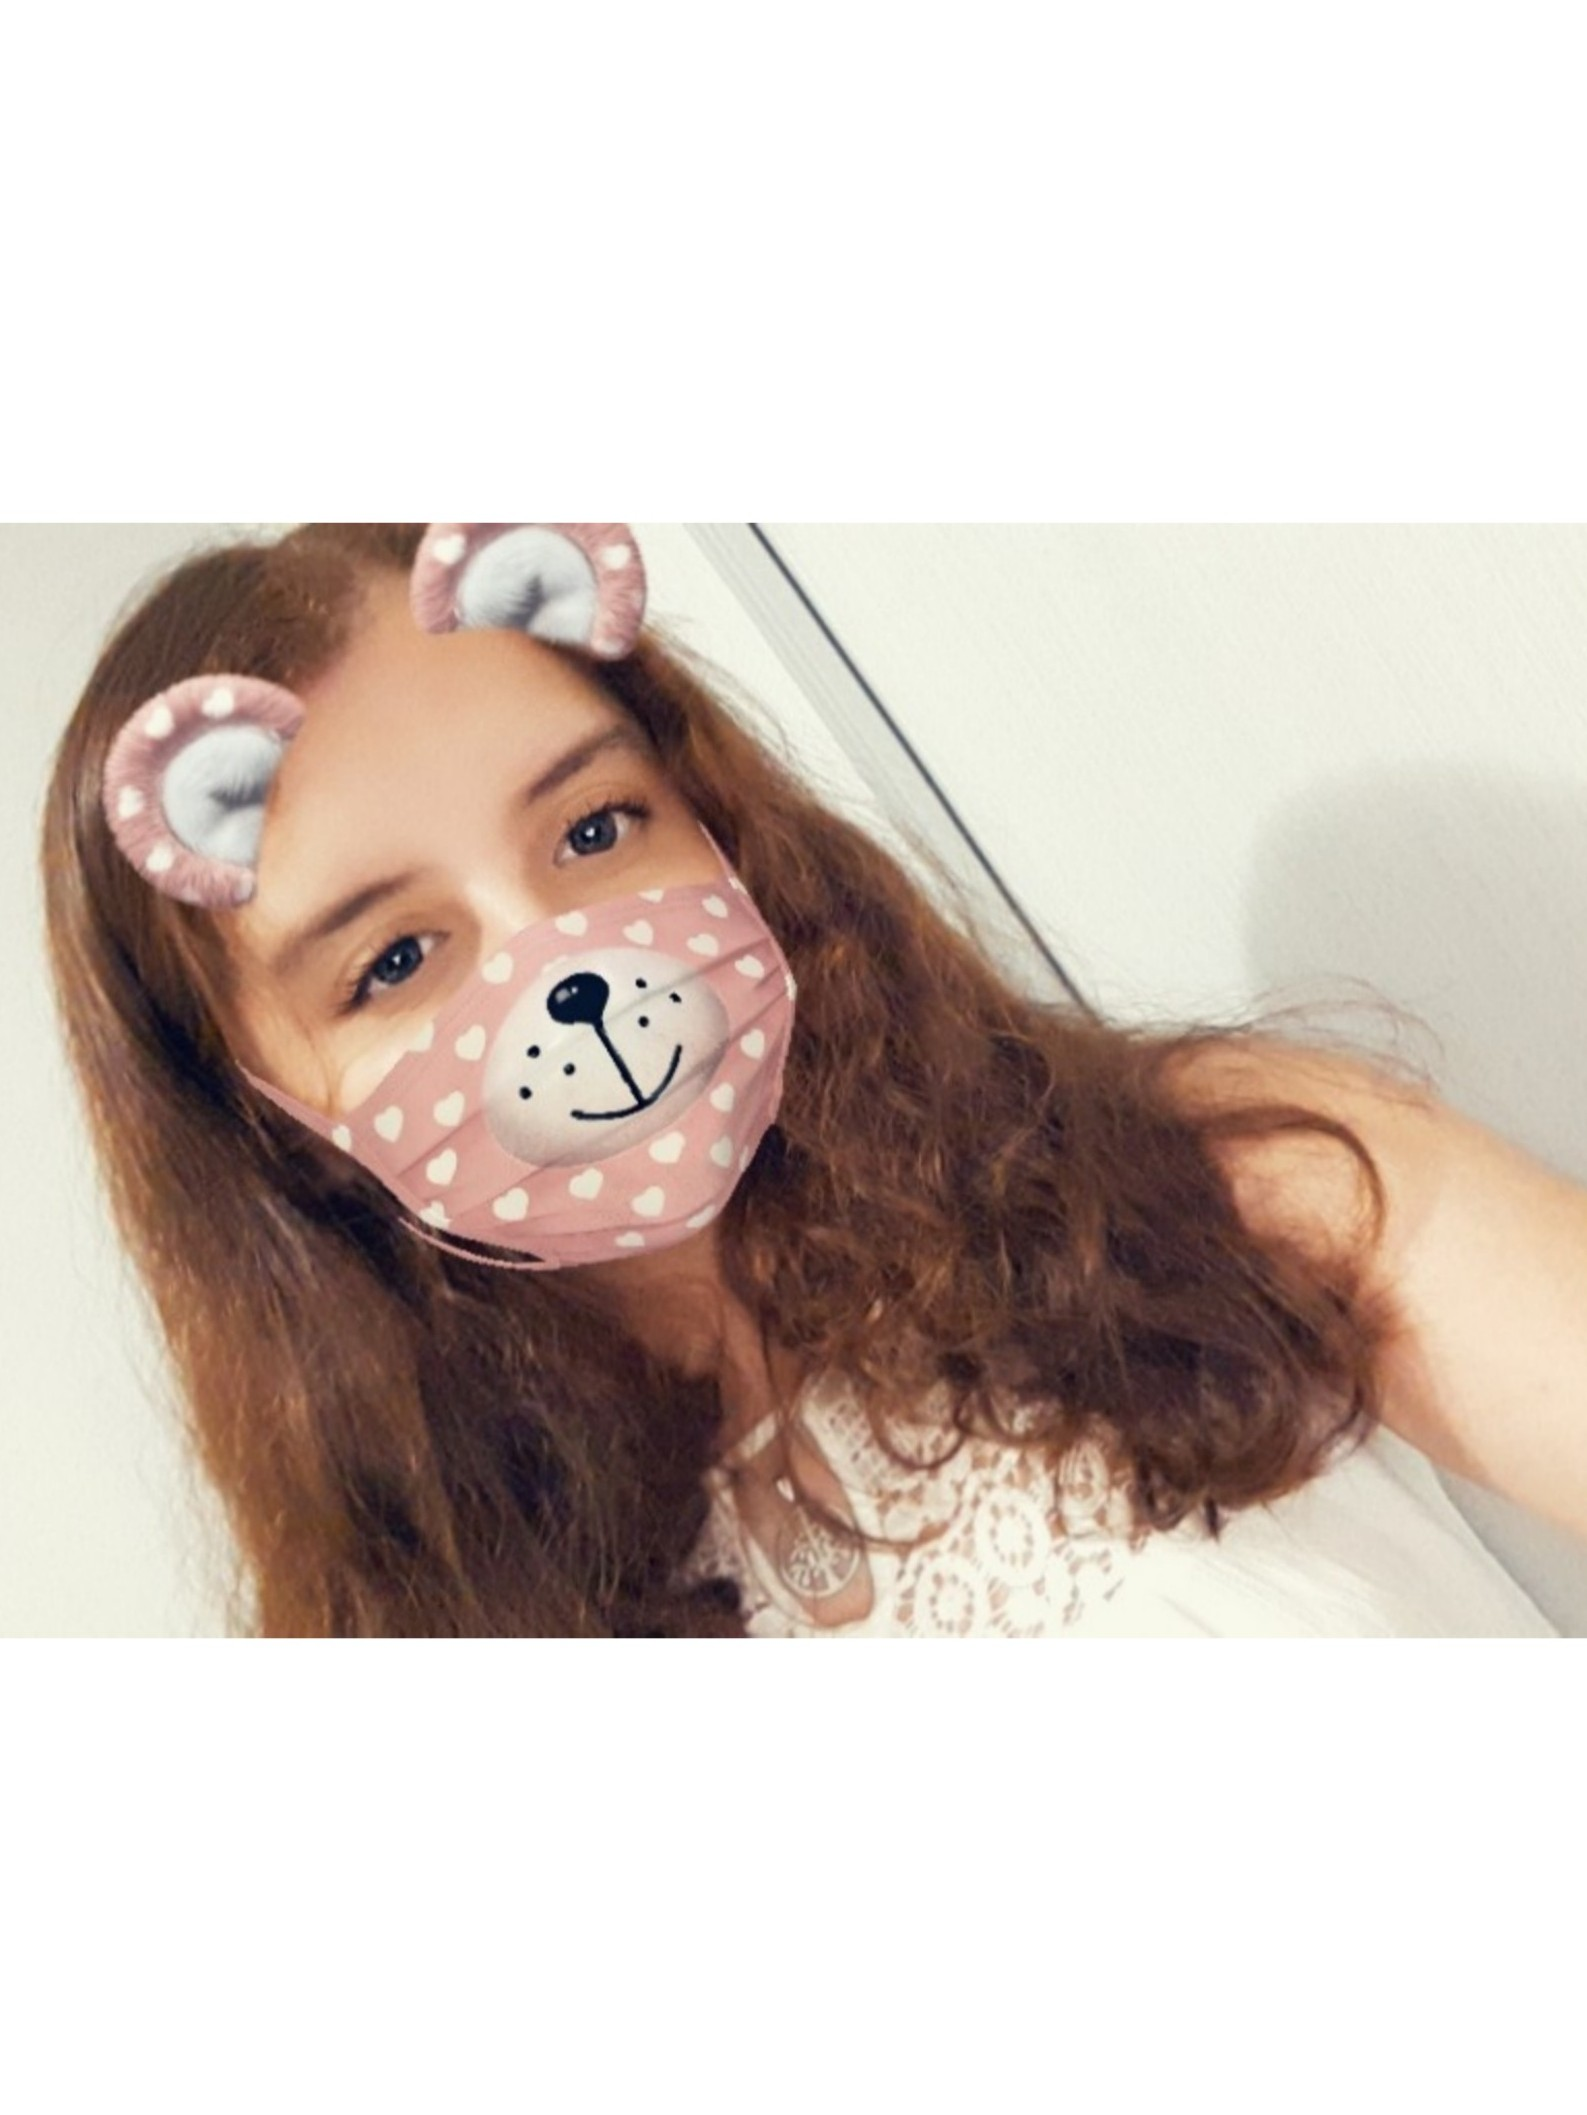 agus_chamo avatar